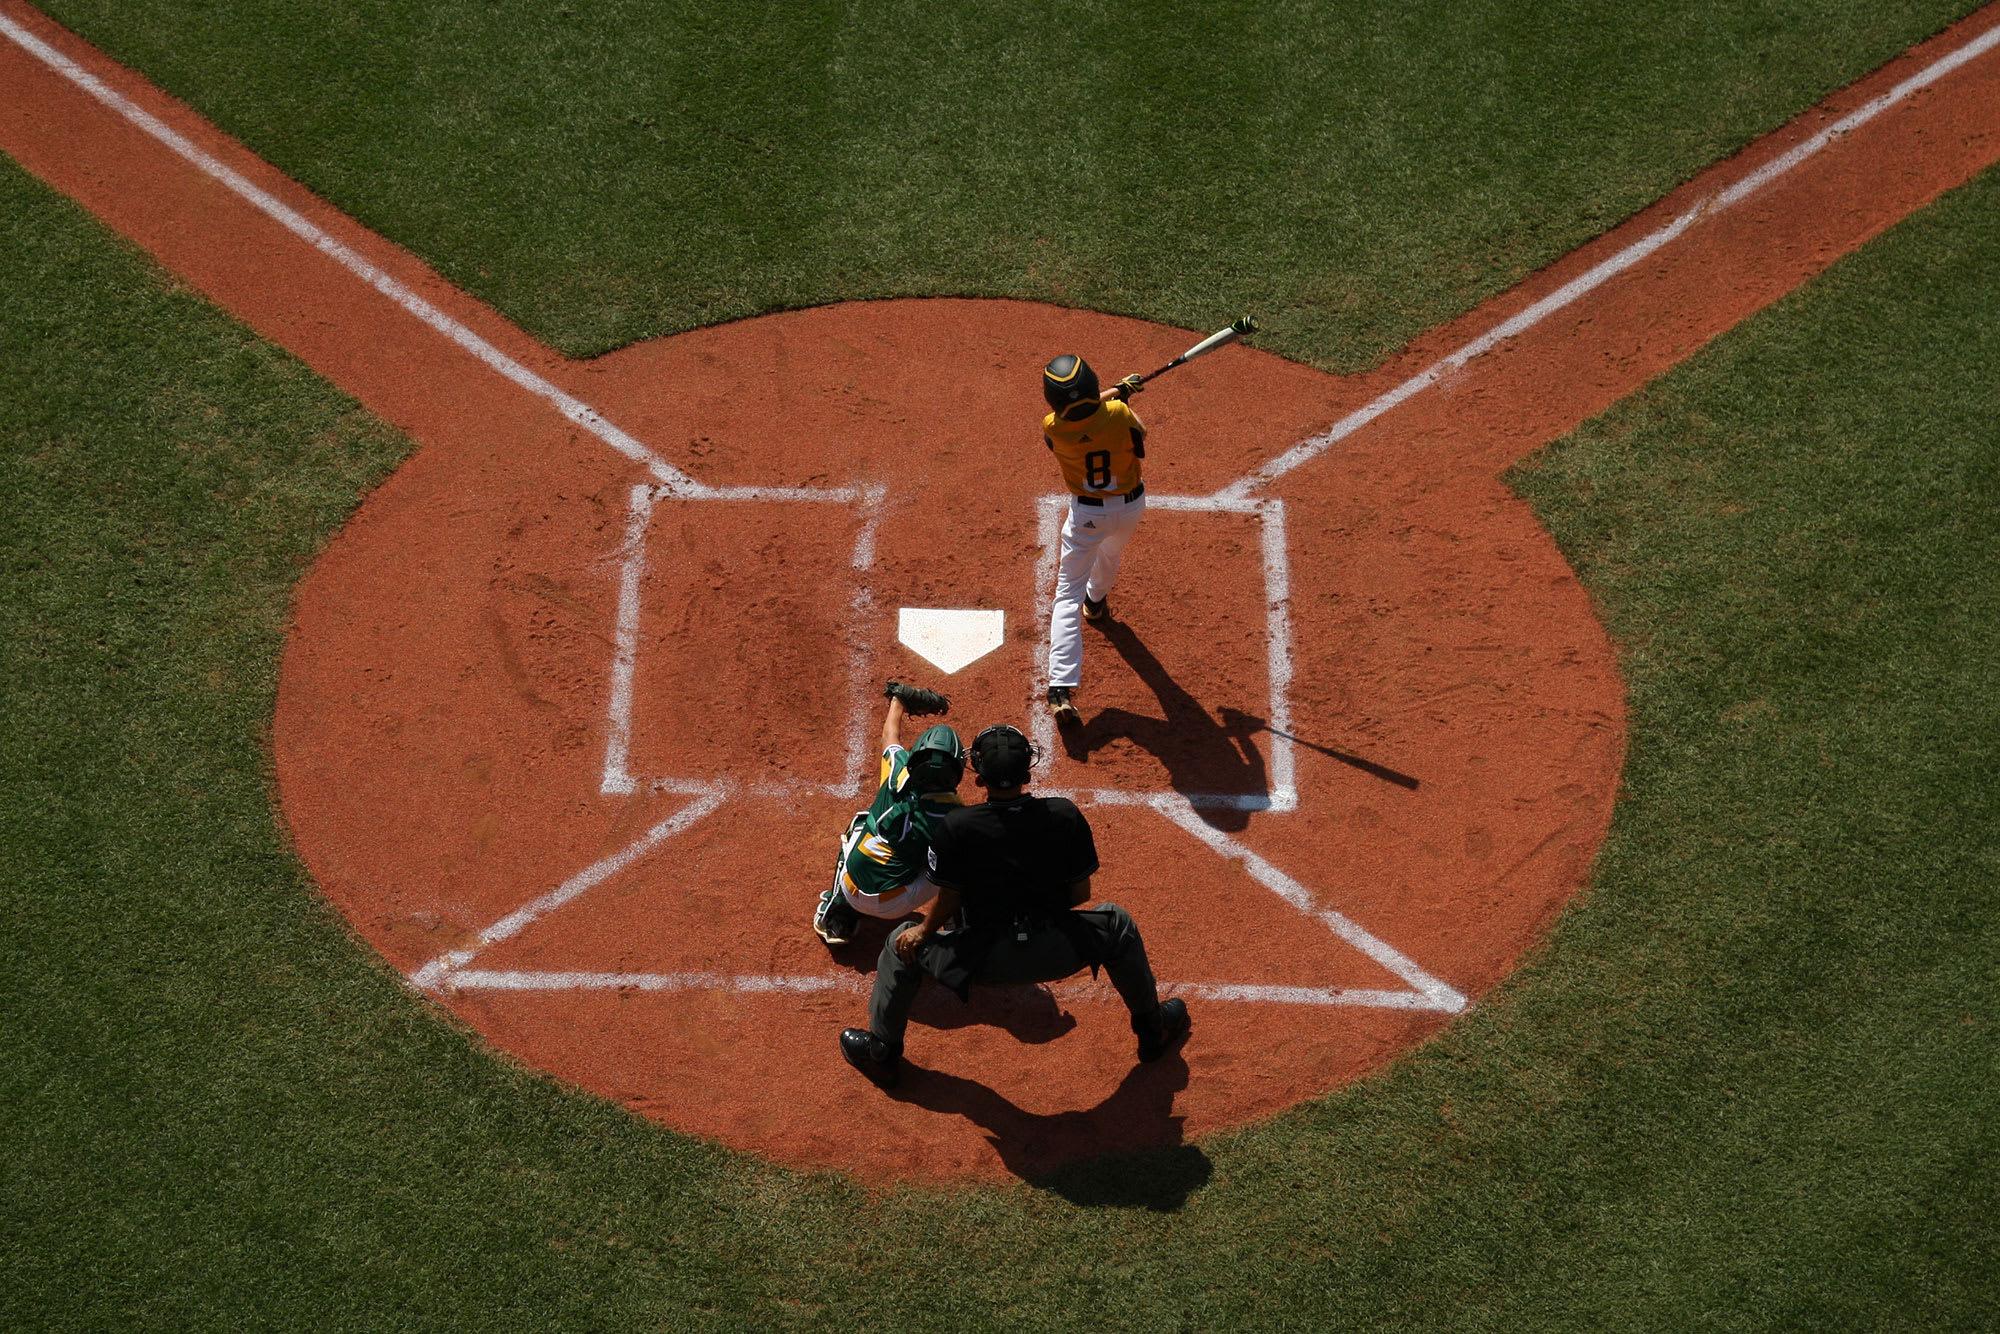 aerial view se batter